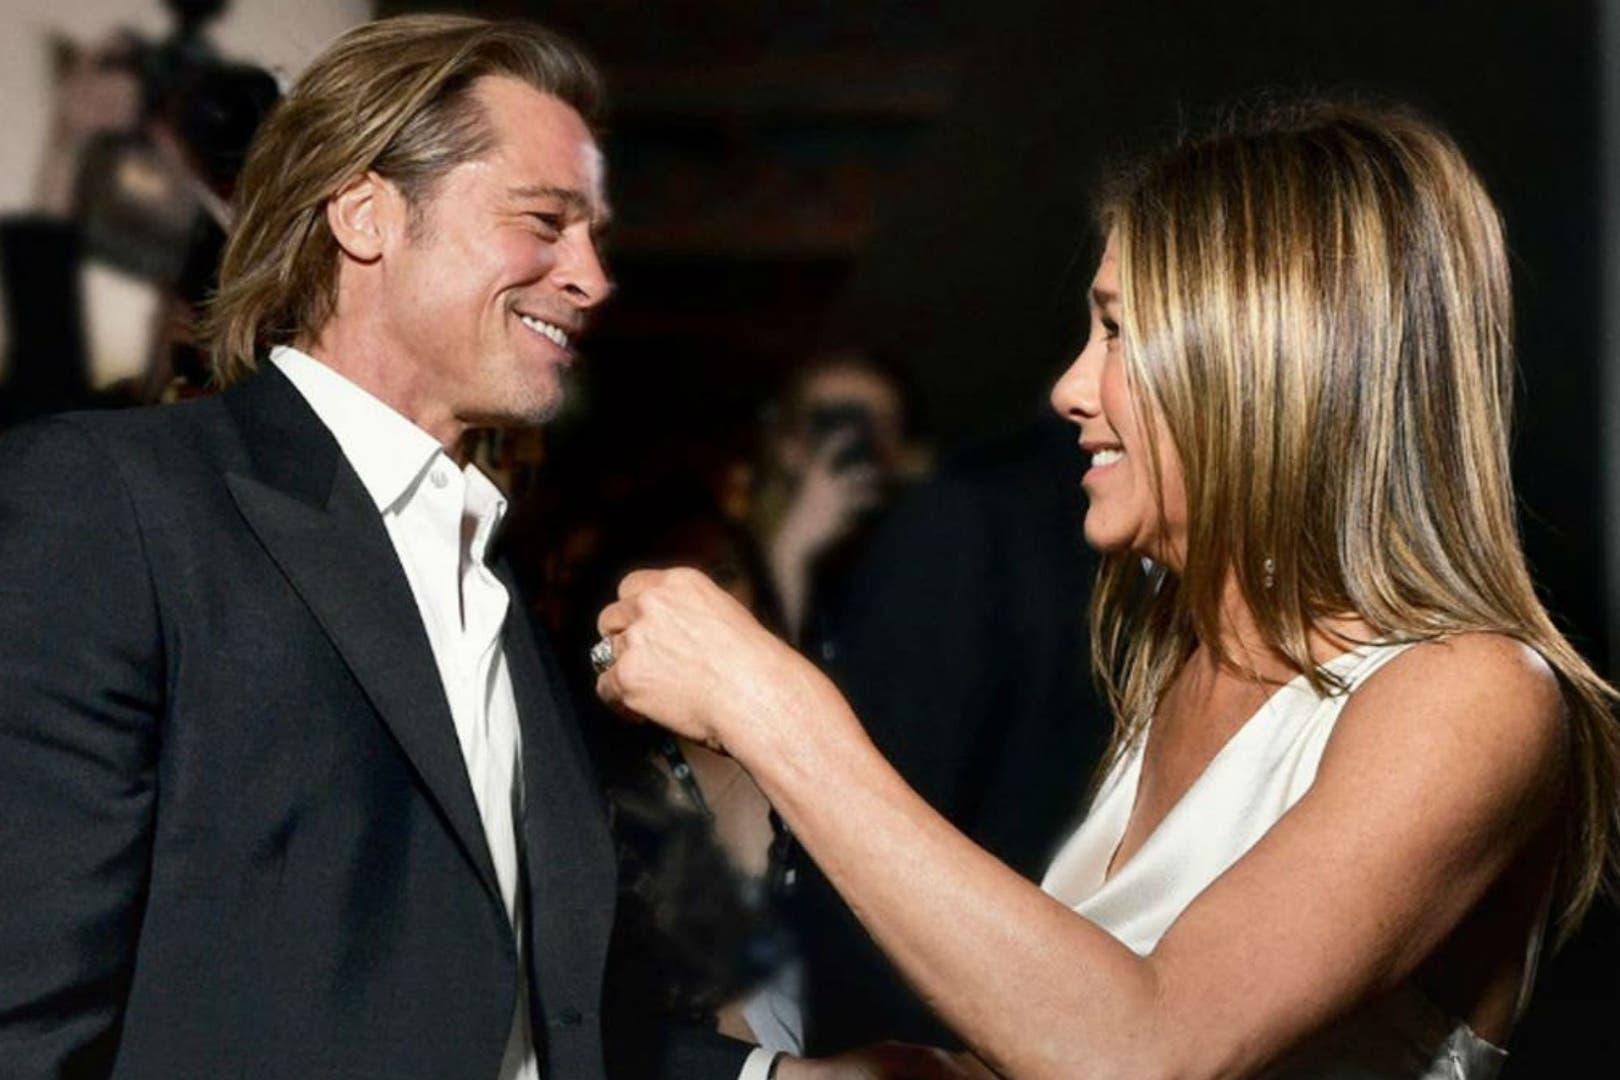 Qué dijo Brad Pitt sobre su acercamiento a Jennifer Aniston